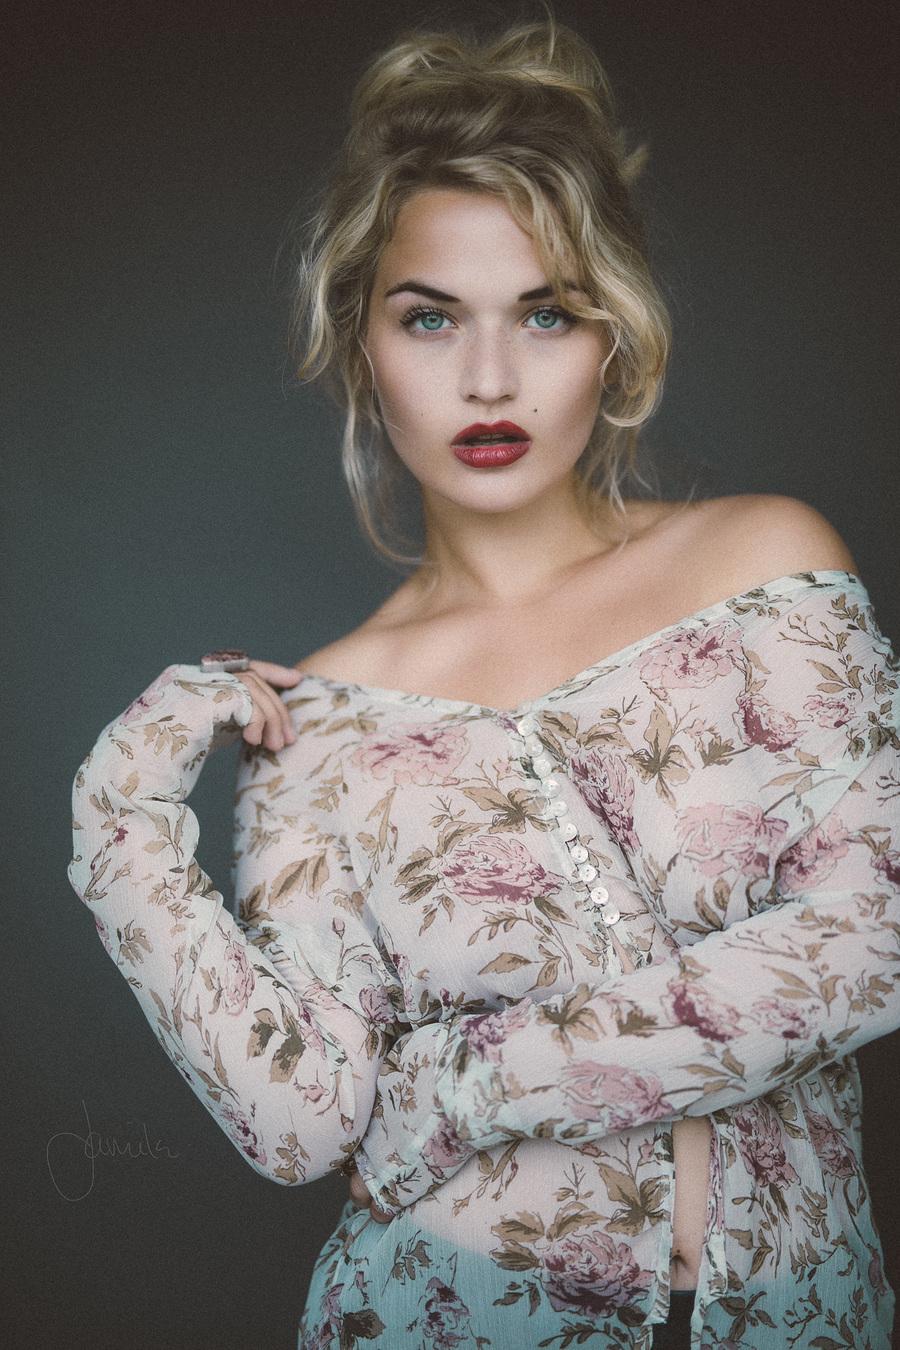 Blue / Model Jessica Megan / Uploaded 15th August 2016 @ 07:05 AM